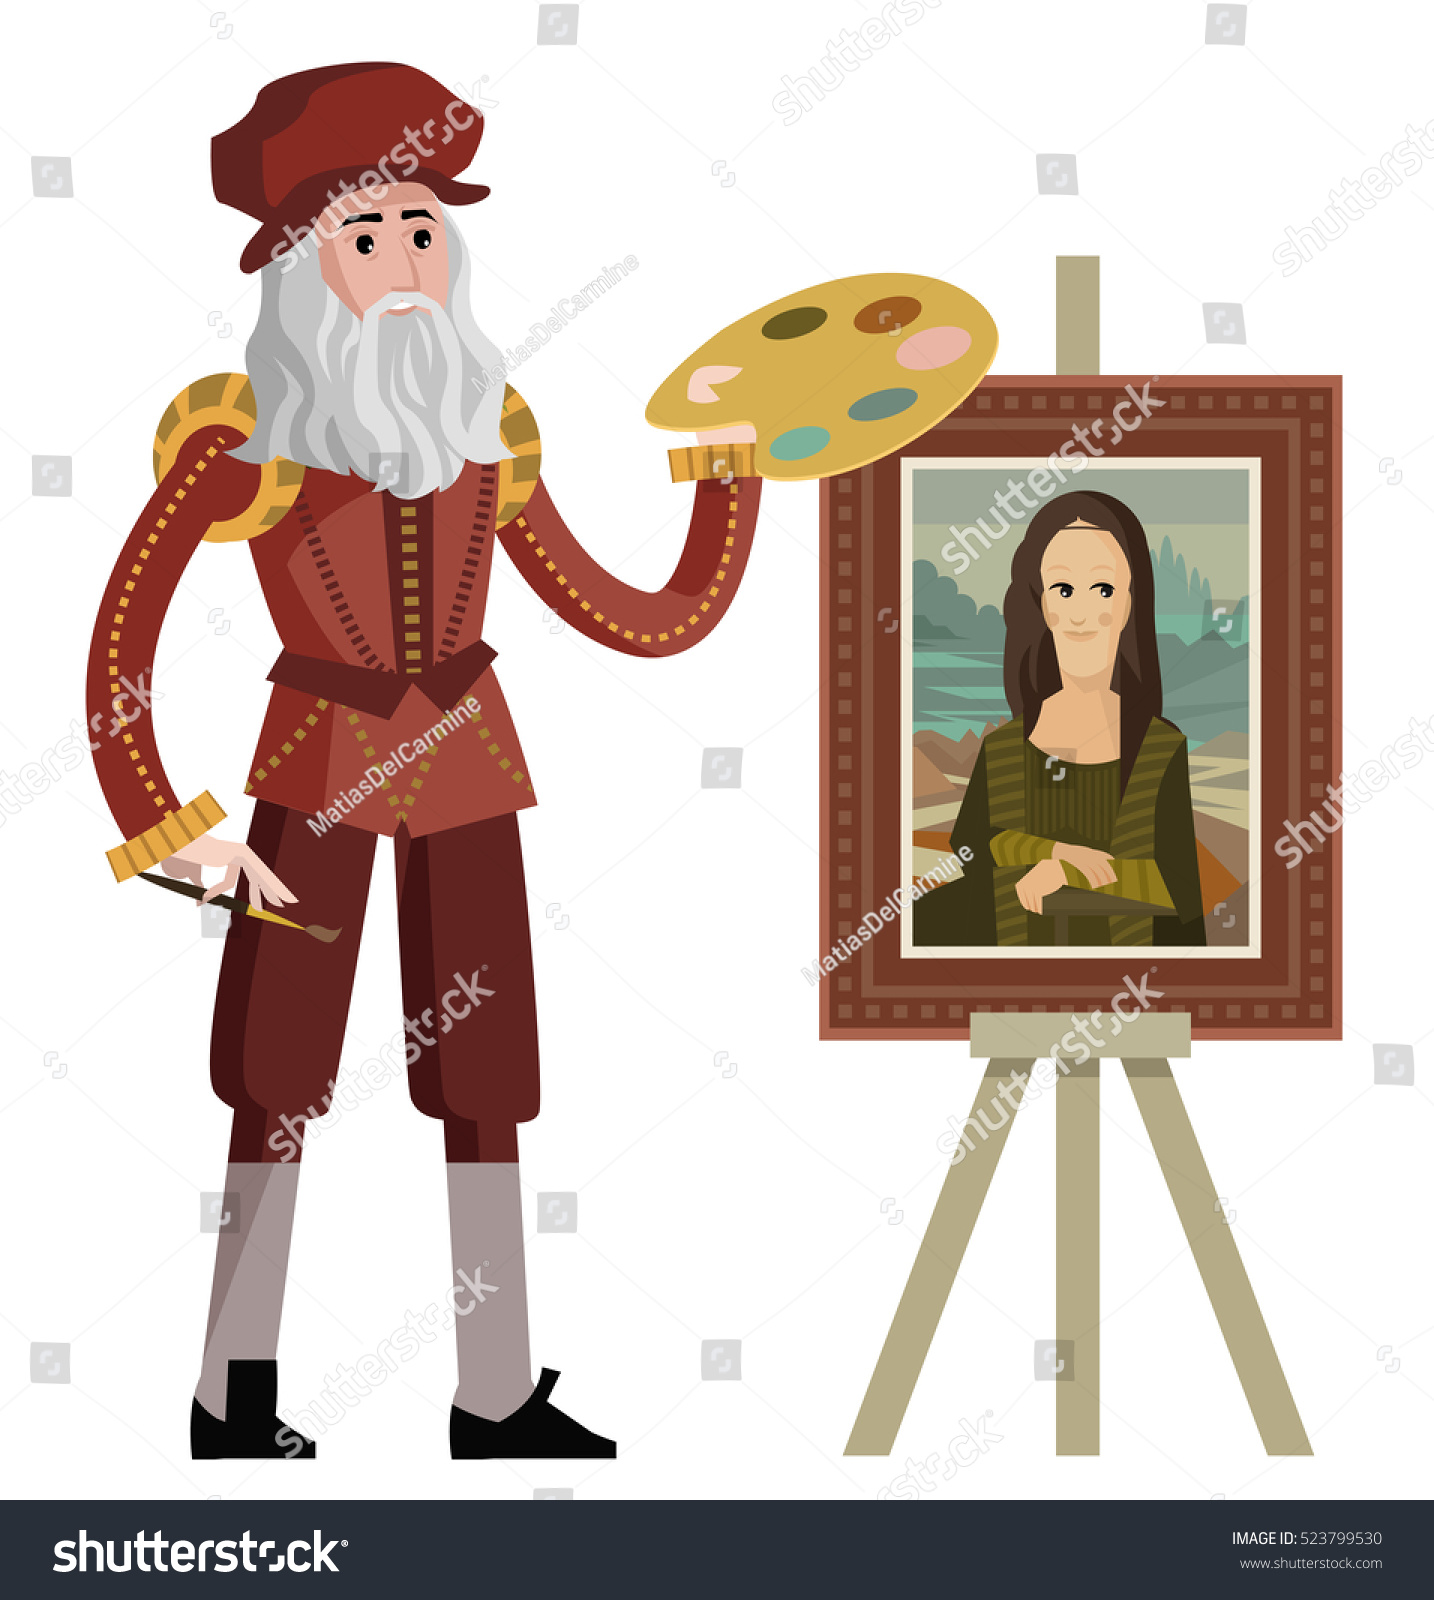 Da vinci painting the mona lisa gioconda stock vector